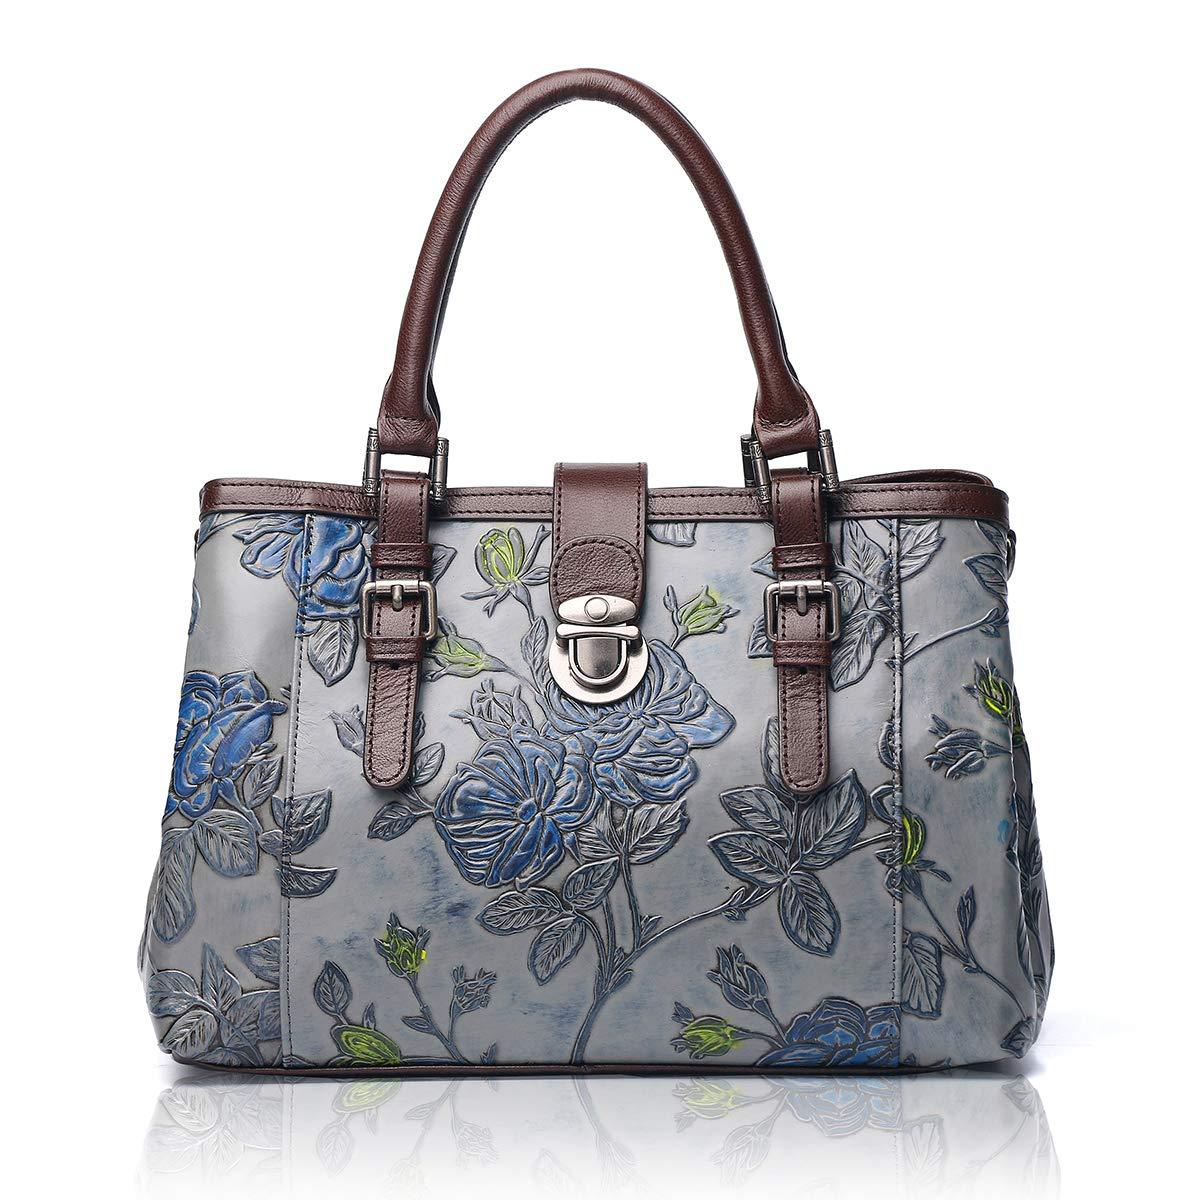 APHISON Designer Unique Embossed Floral Cowhide Leather Tote Style Ladies Top Handle Bags Handbags C817 Gray